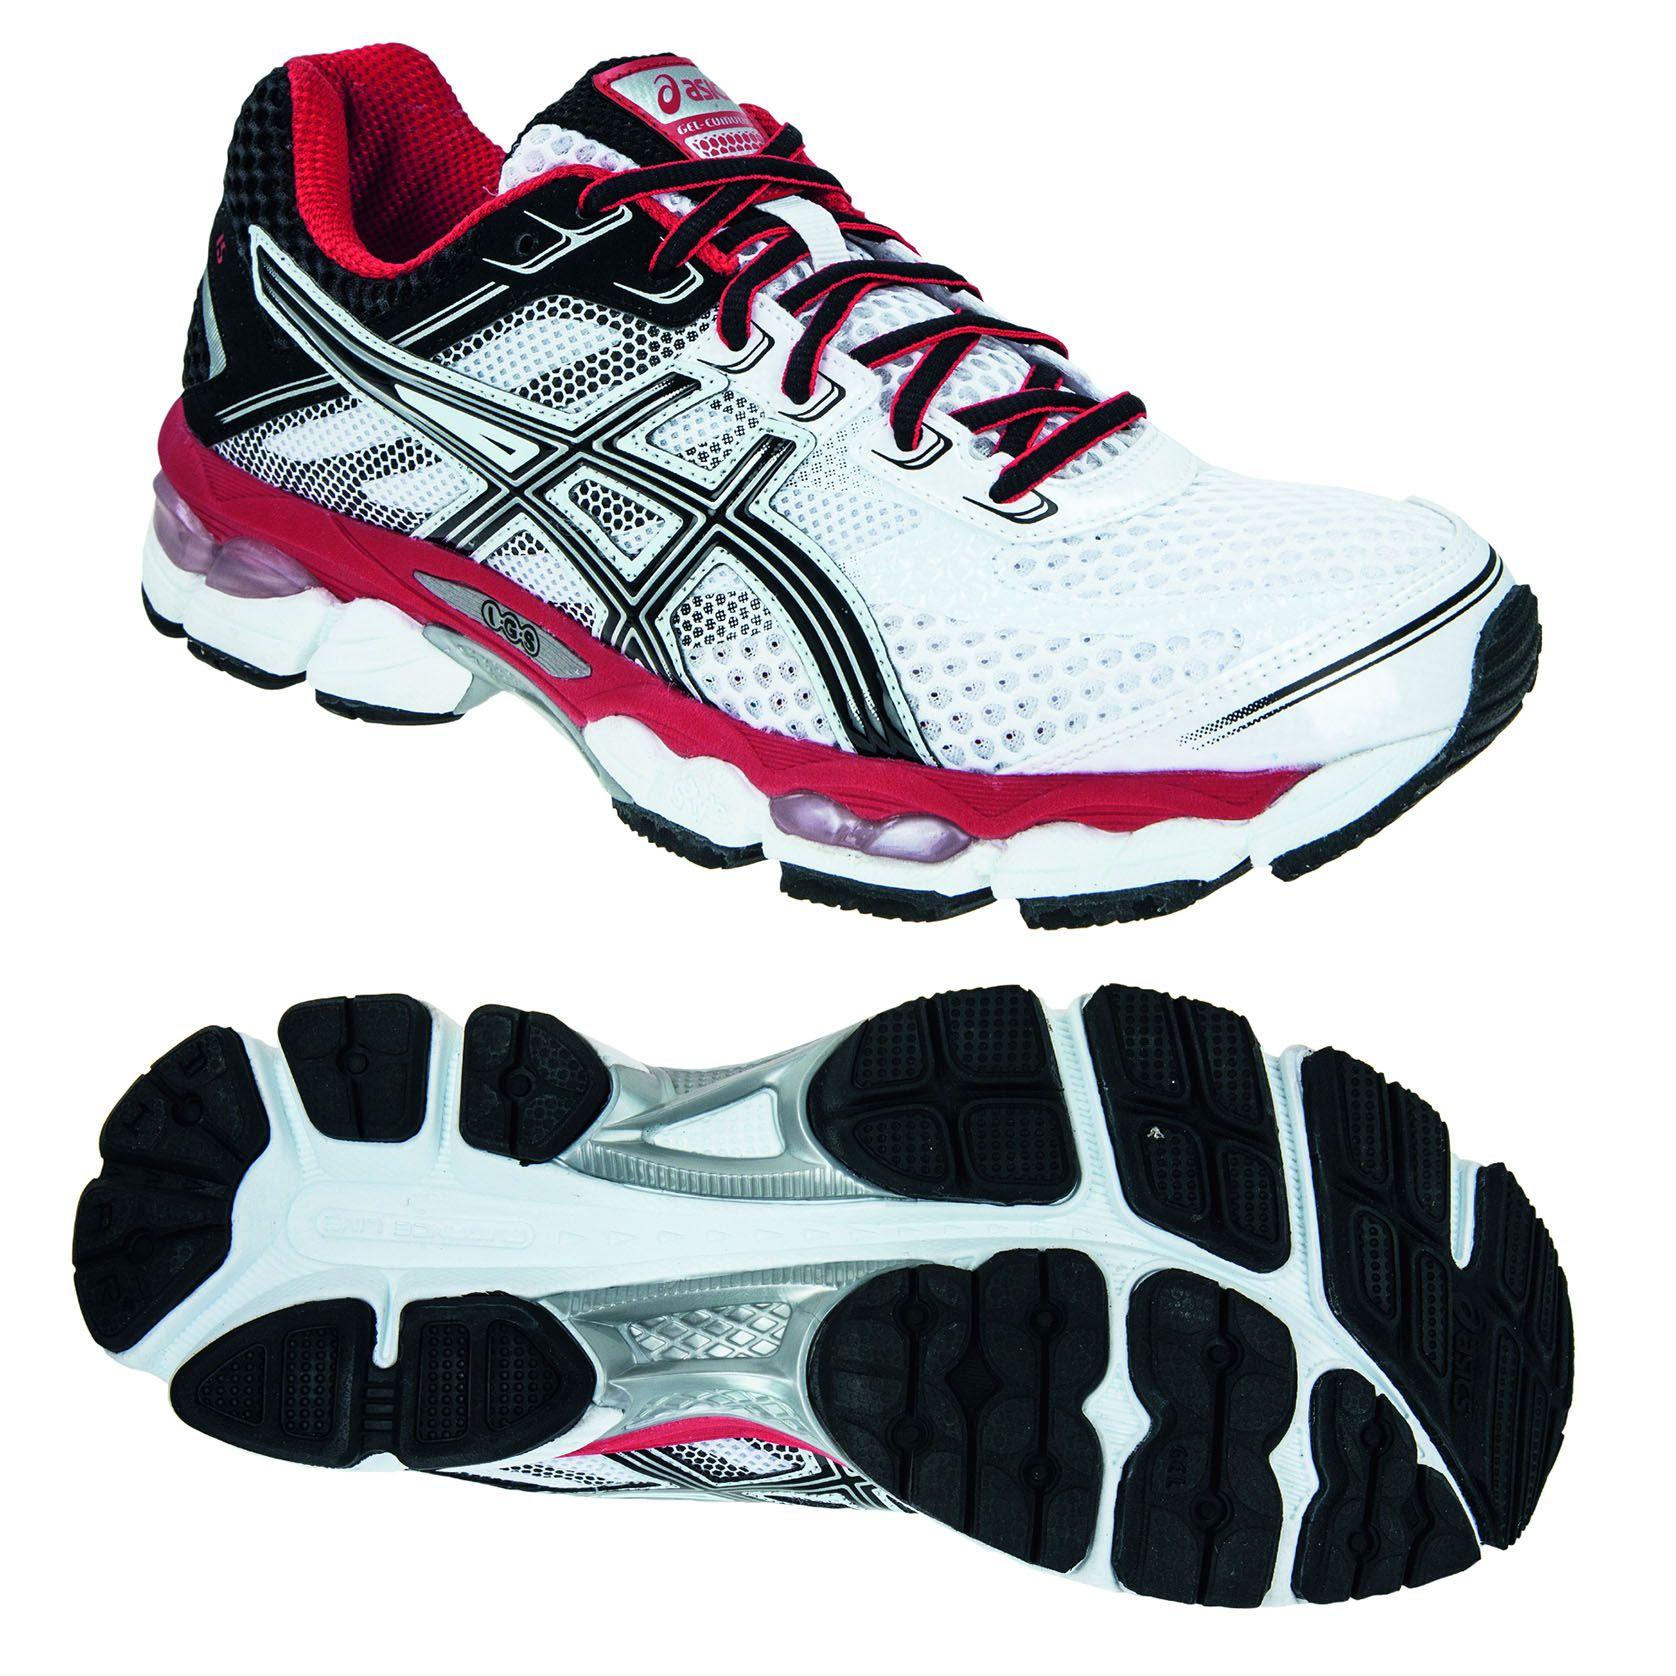 Asics Gel-Cumulus 15 Mens Running Shoes - Sweatband.com